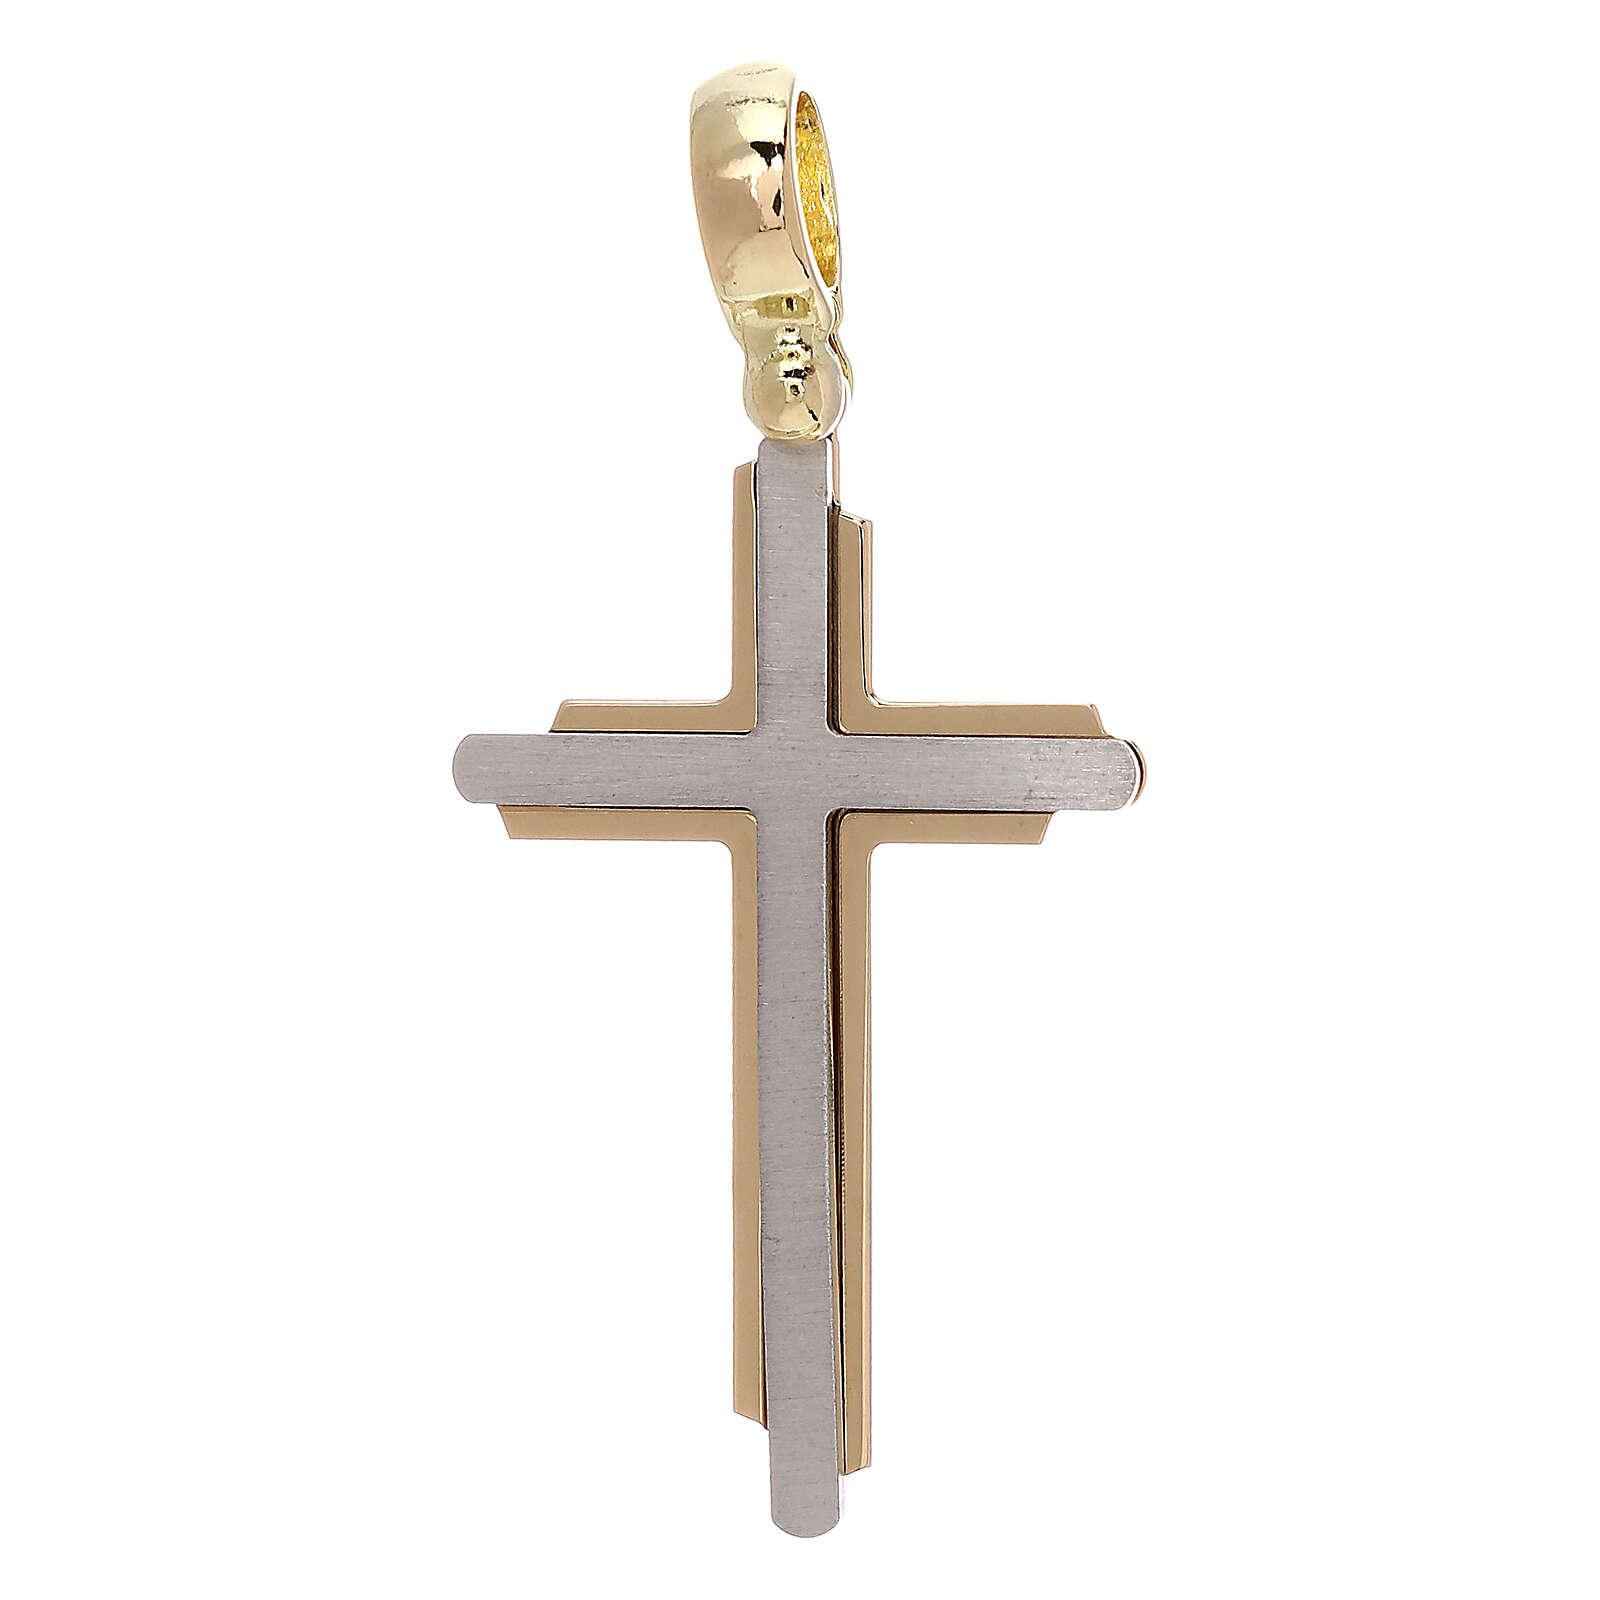 Cross irregular base white and yellow 18-carat gold 2.75 gr 4